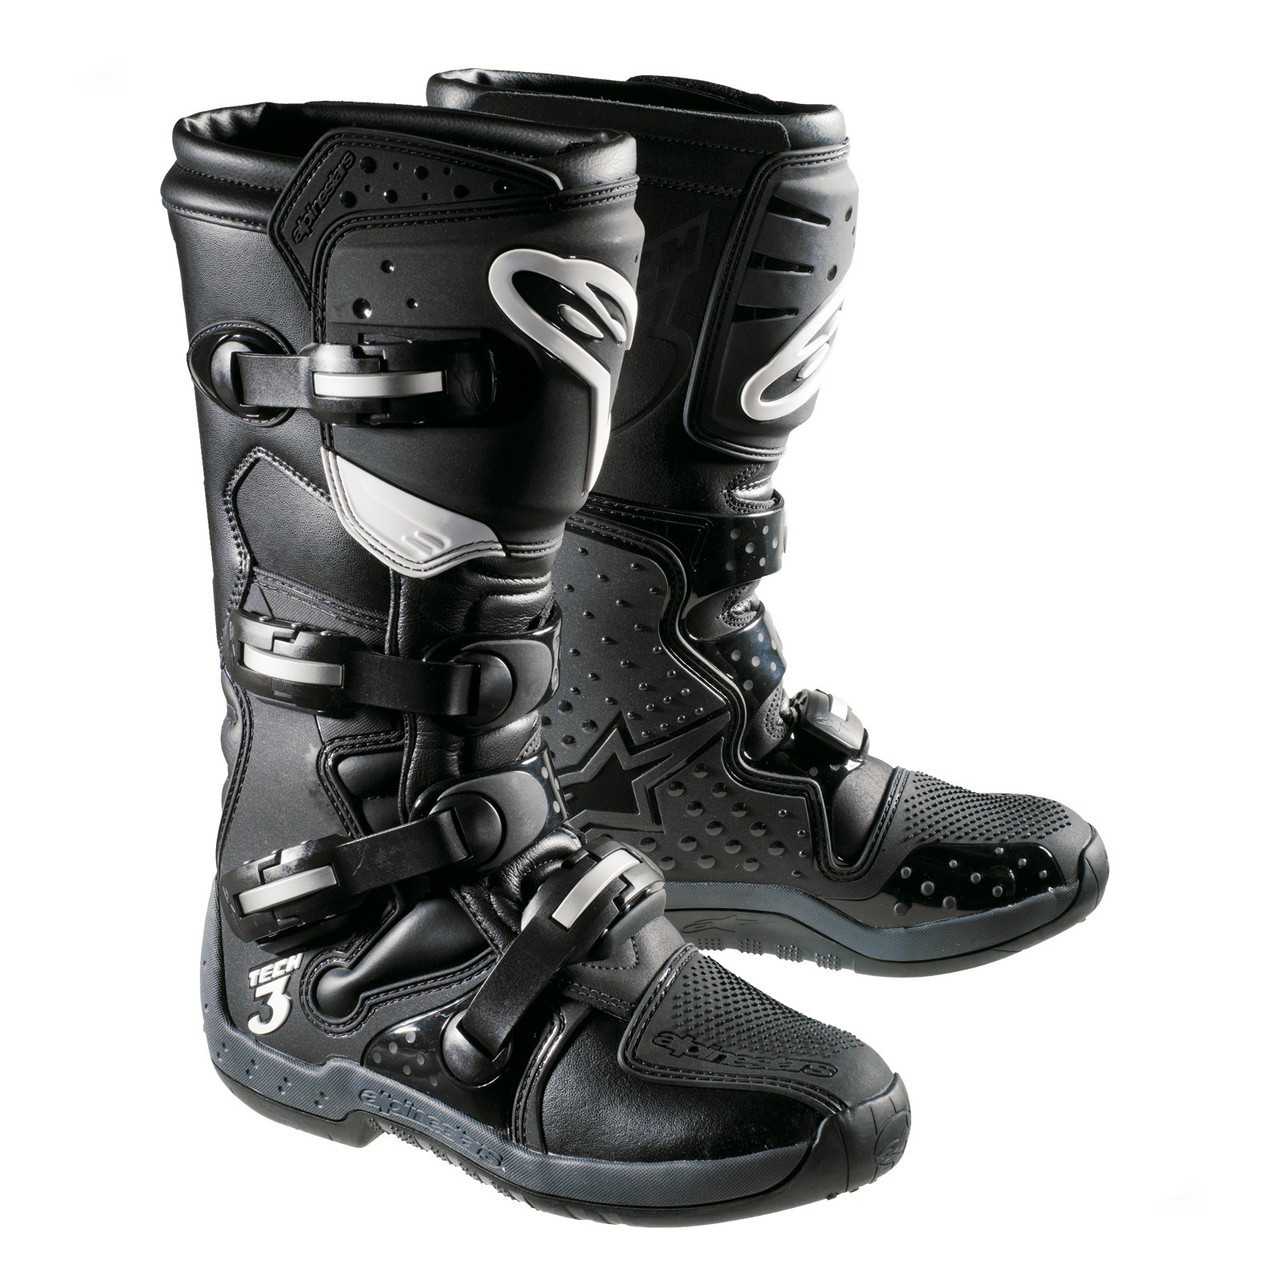 "Мотоботы Alpinestars TECH 3 ""44"" black"